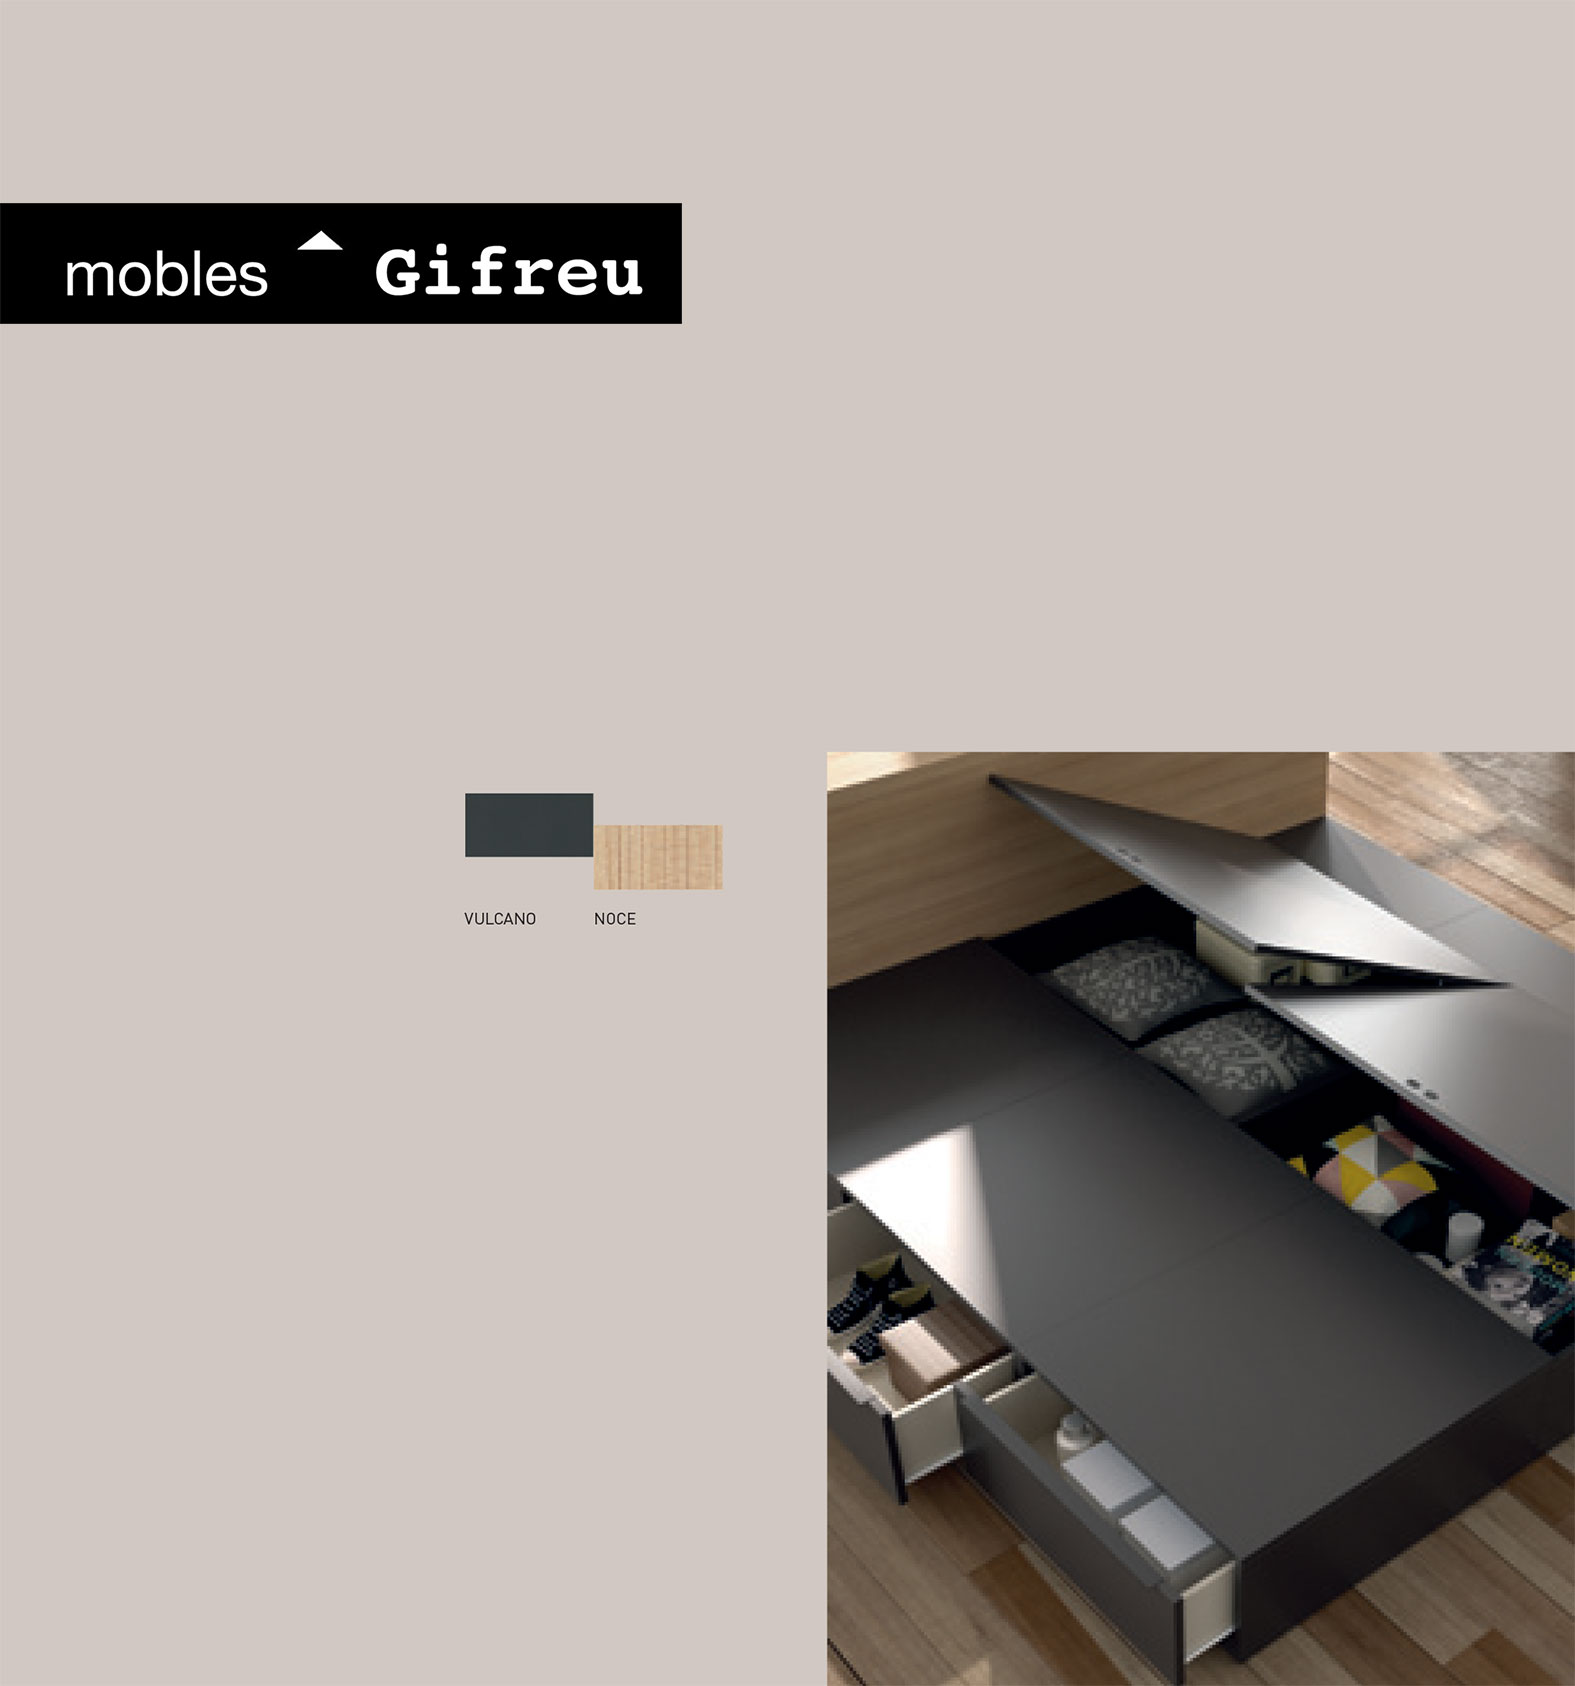 Infinity casual mobles gifreu - Infinity jjp ...